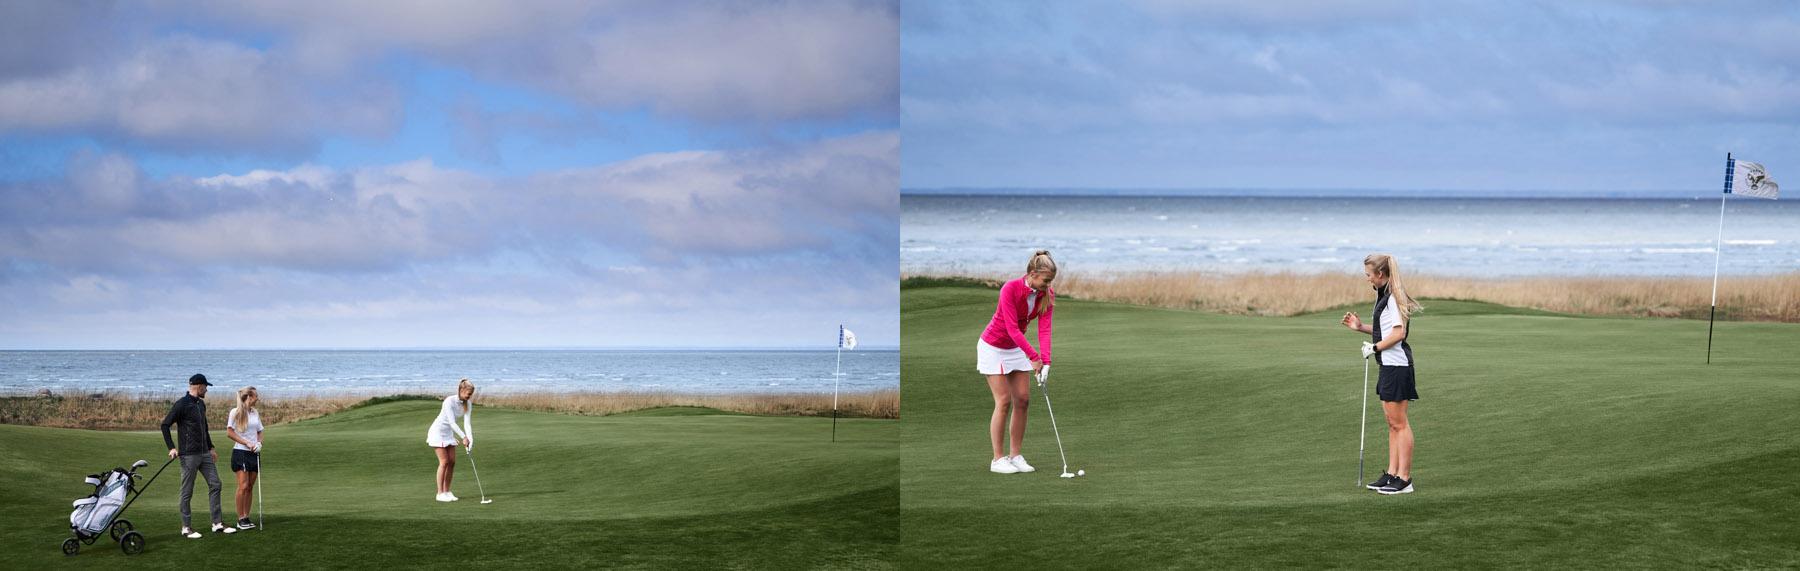 reklaamfotod fotograaf Kristian Kruuser sport golf fotograaf tallinnas-2.jpg